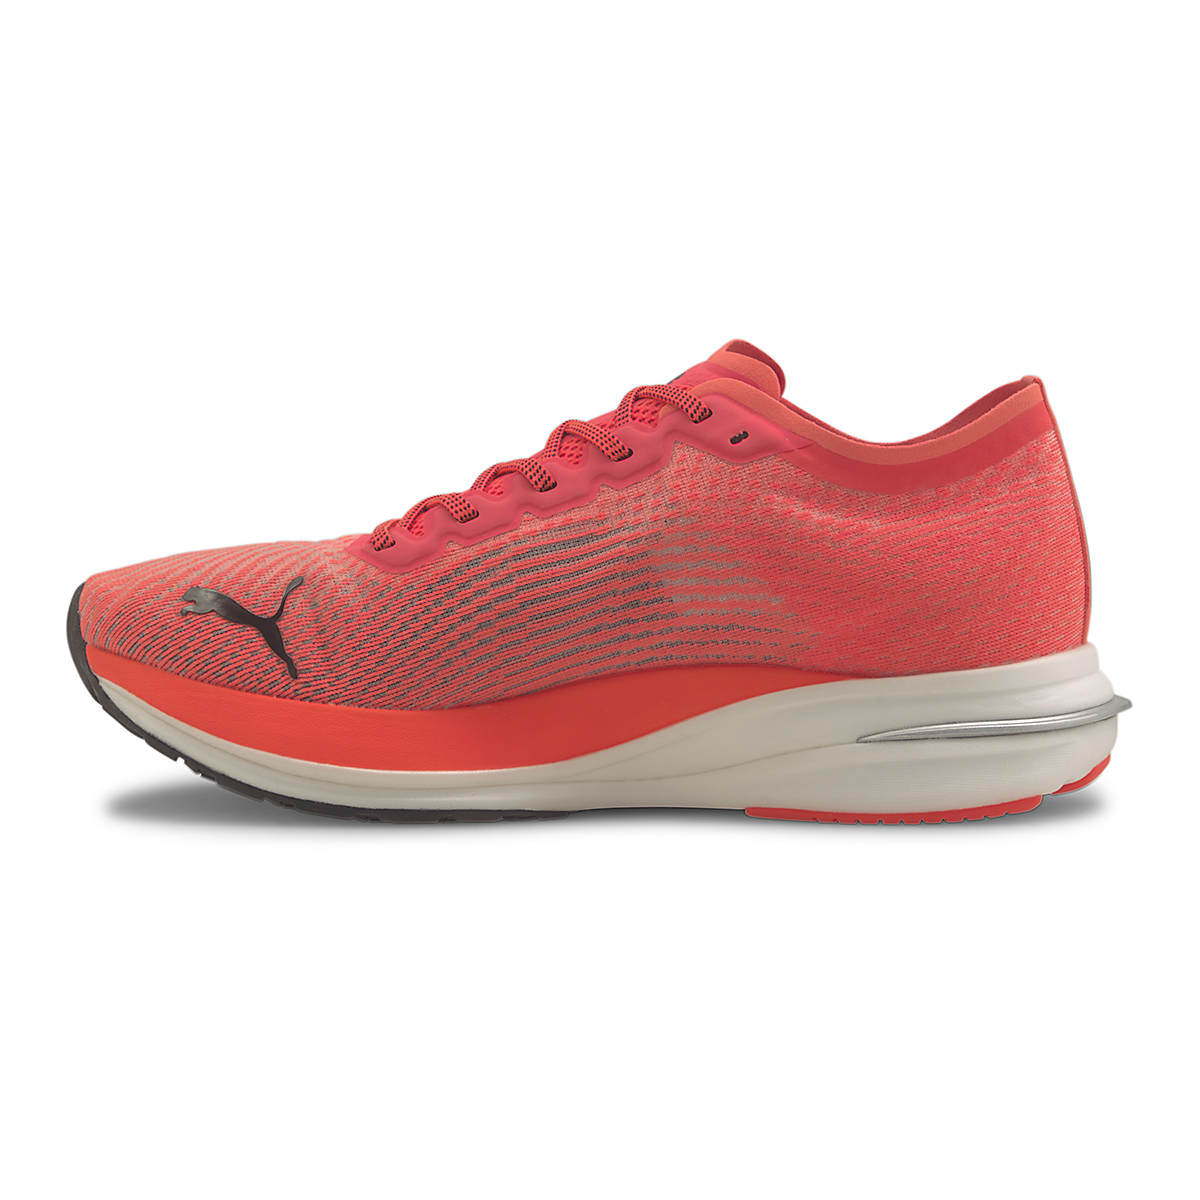 Men's Puma Deviate Nitro Running Shoe - Color: Lava Blast-Puma Black - Size: 7 - Width: Regular, Lava Blast-Puma Black, large, image 2